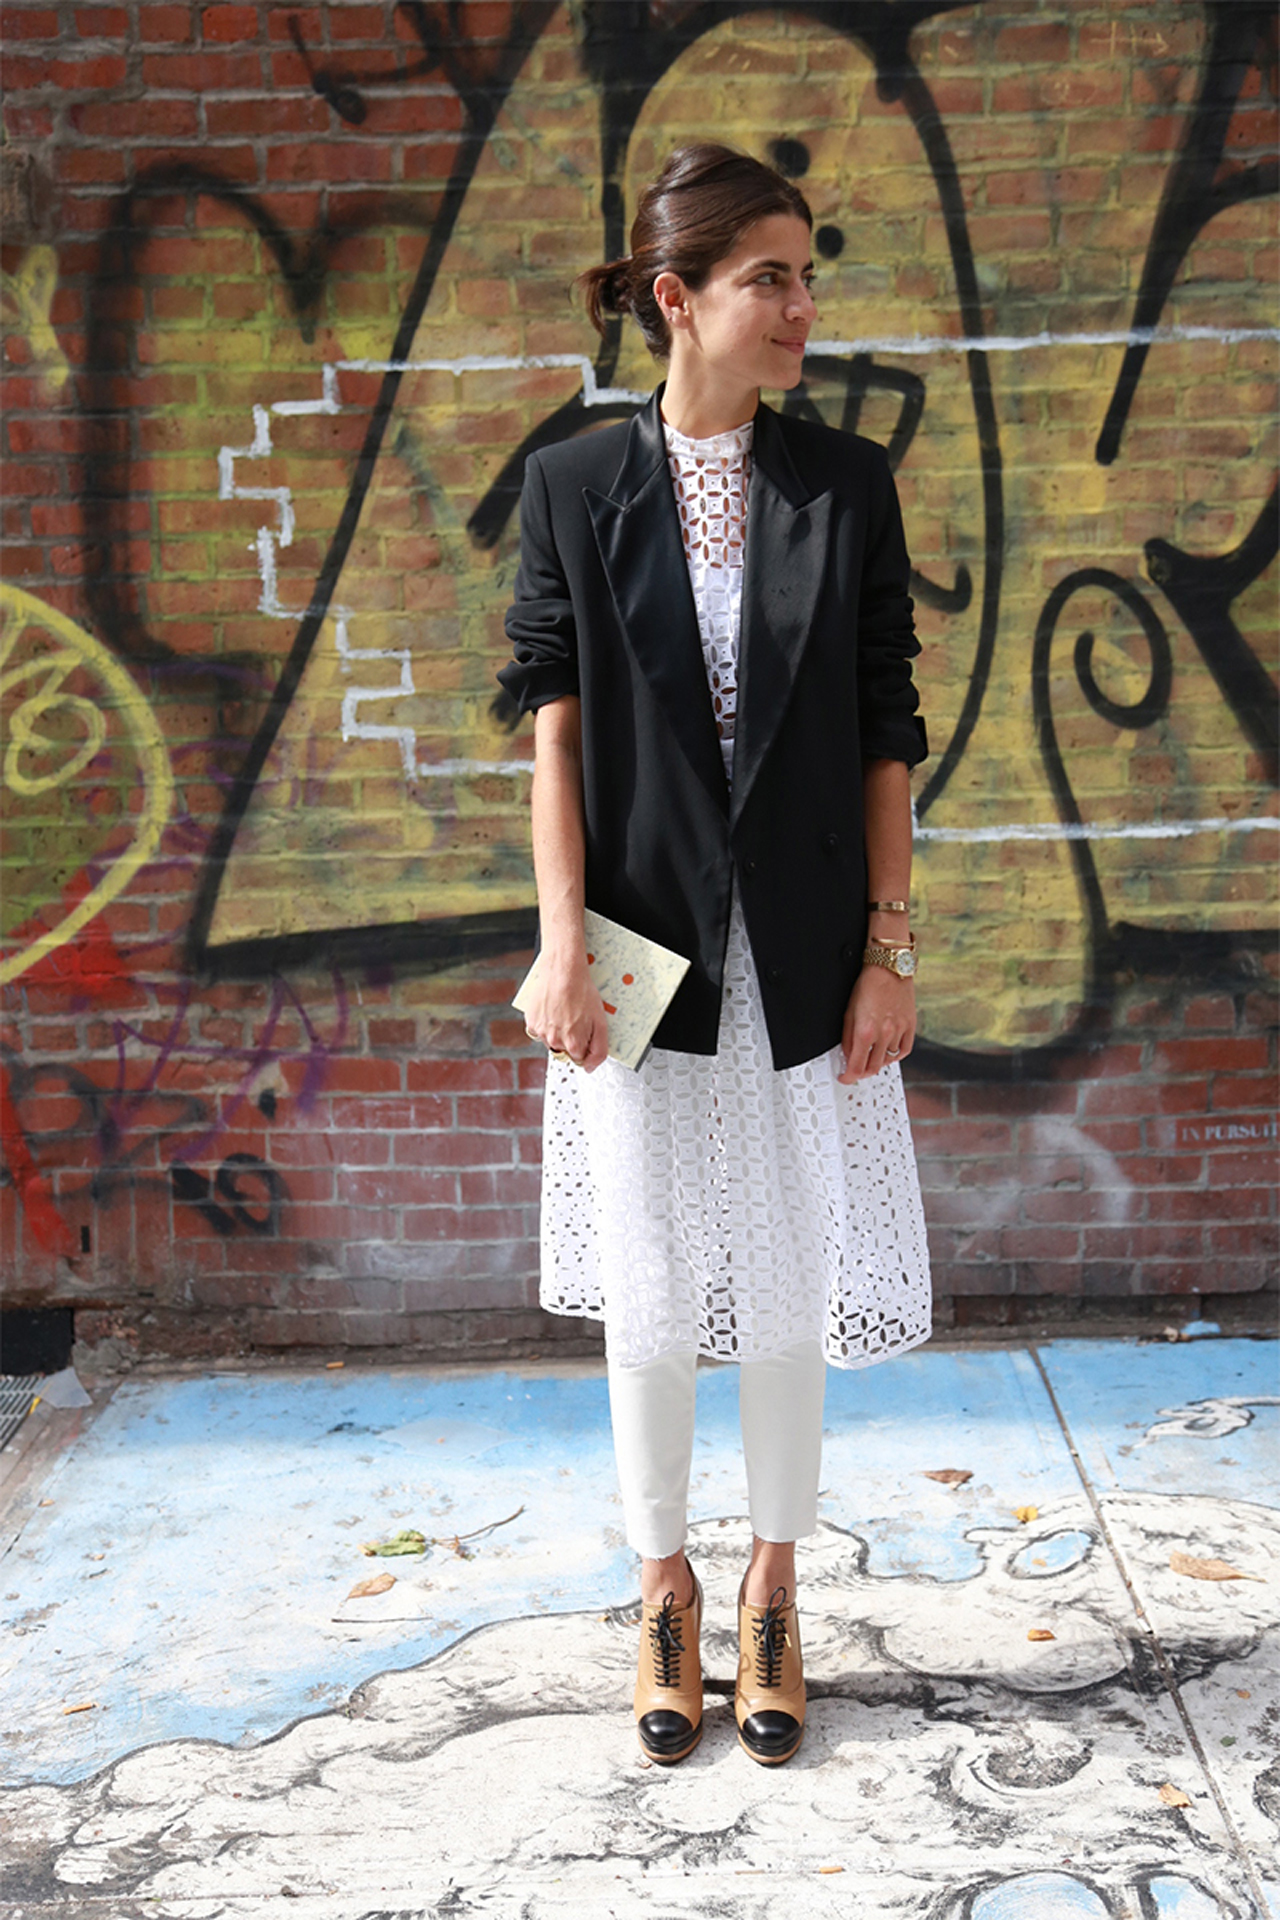 vestito_sopra_i _pantaloni_dressing_and_toppings_2